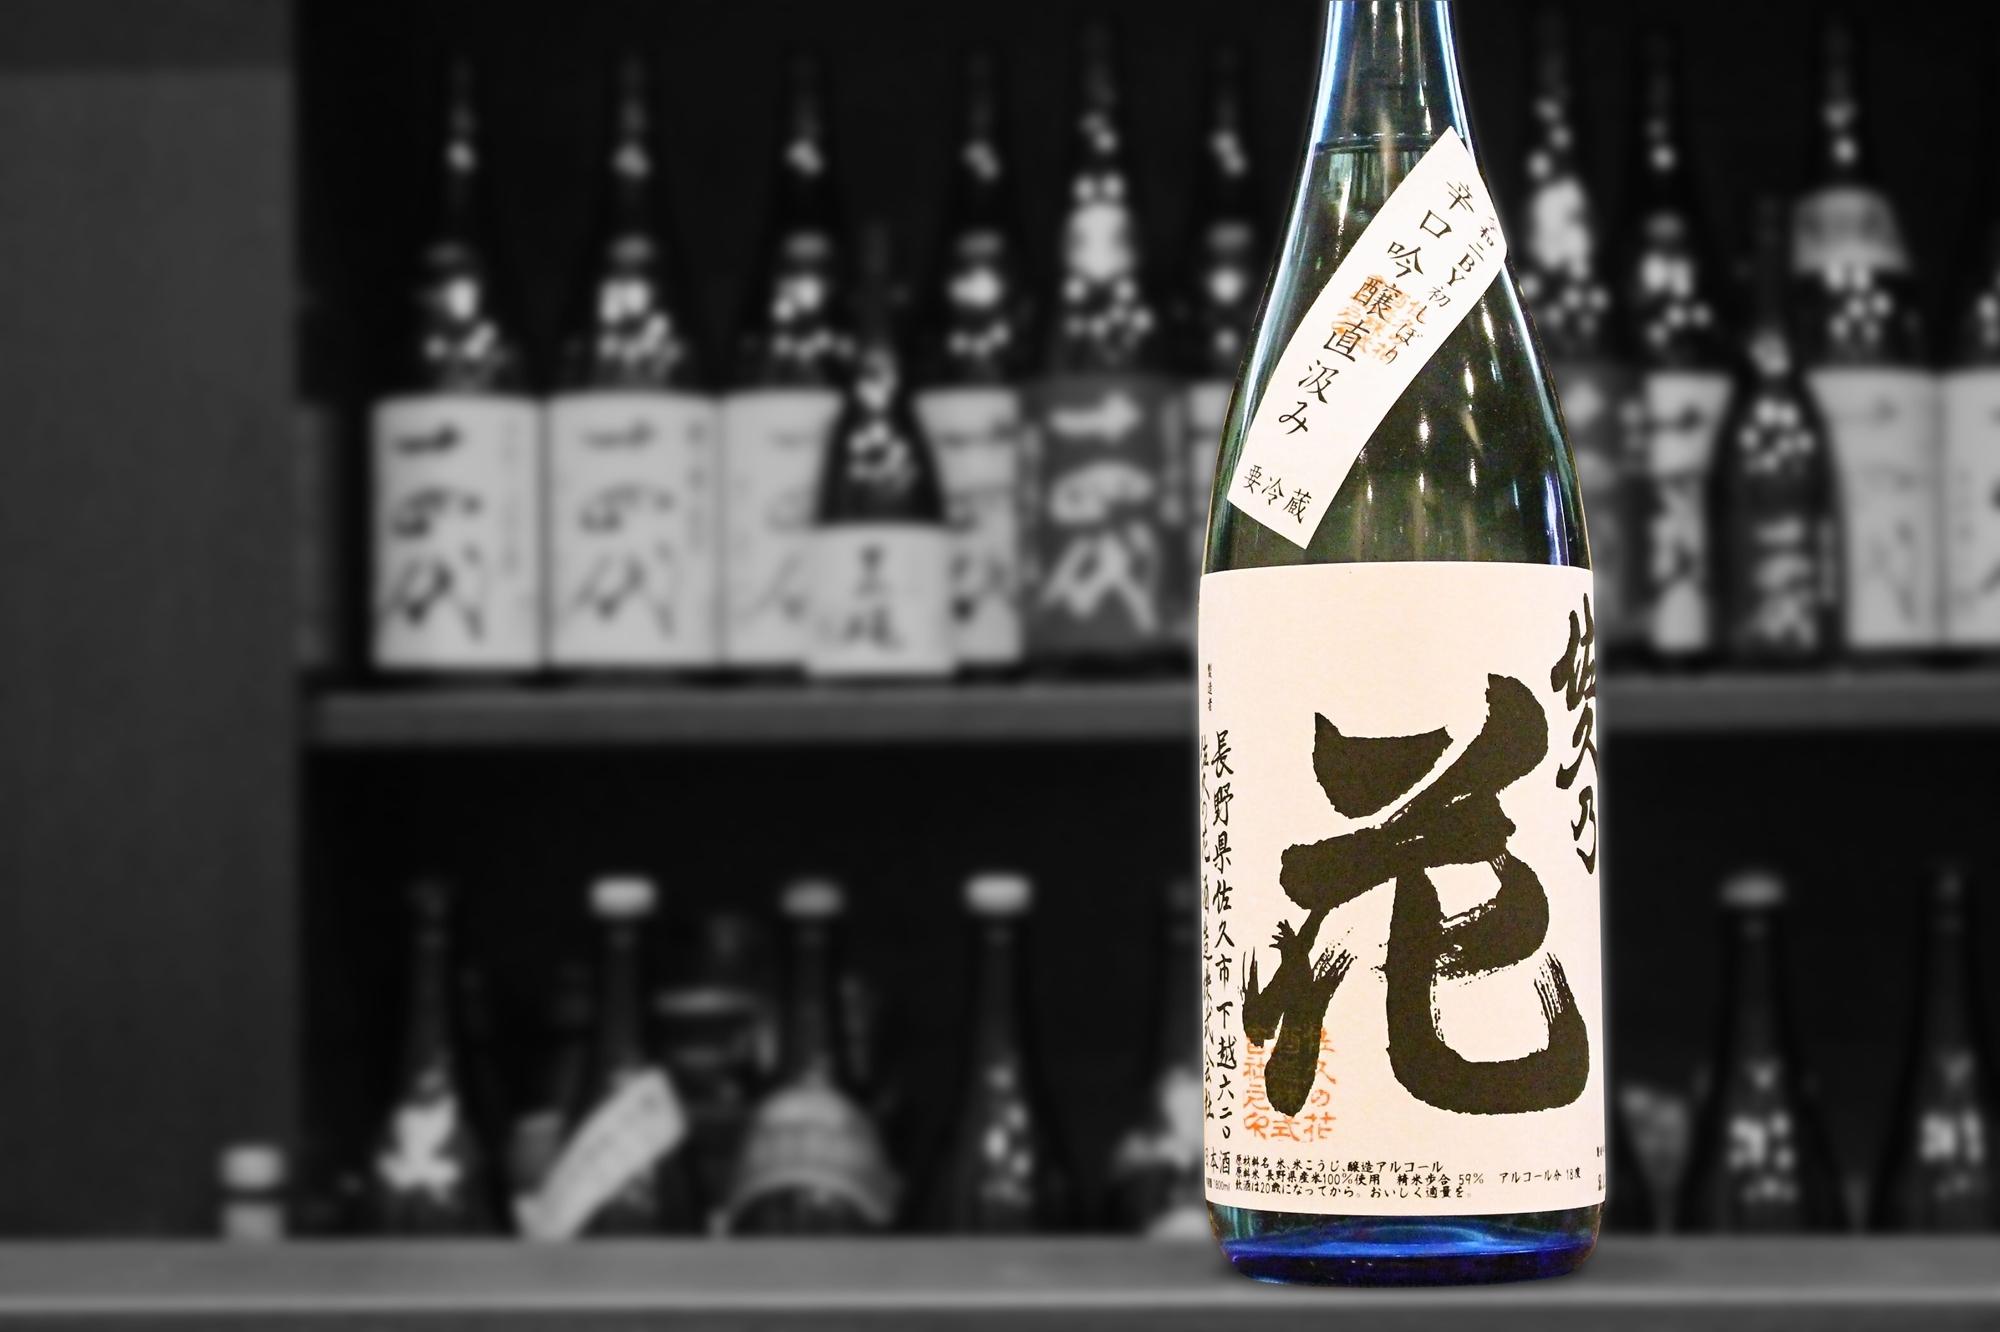 佐久の花辛口吟醸直汲み生原酒202102-001